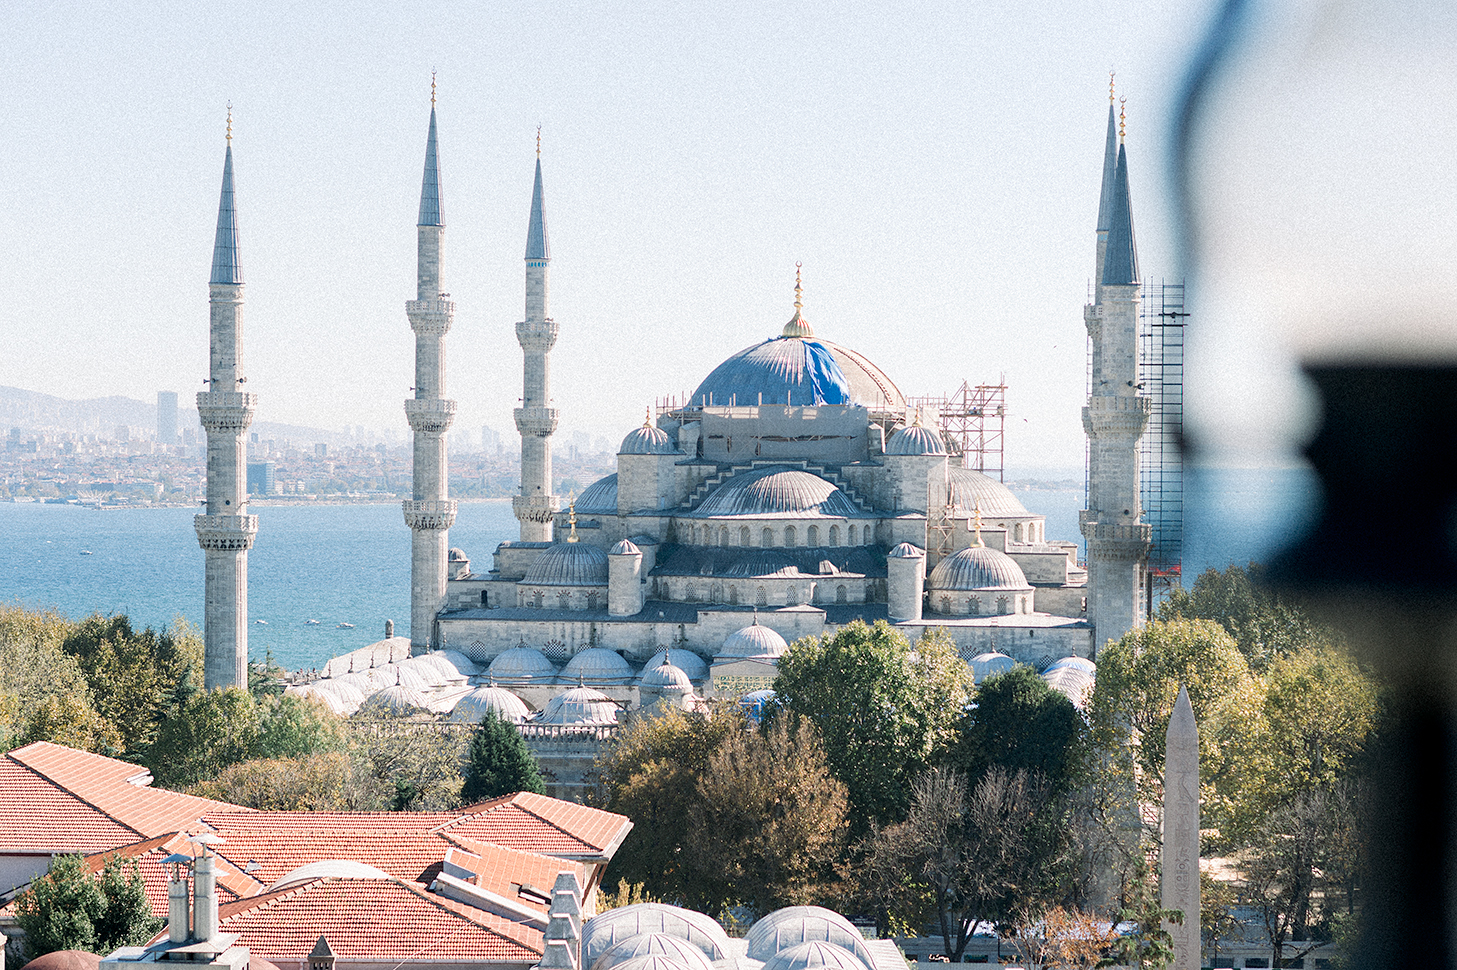 20181027_ISTANBUL_008.jpg